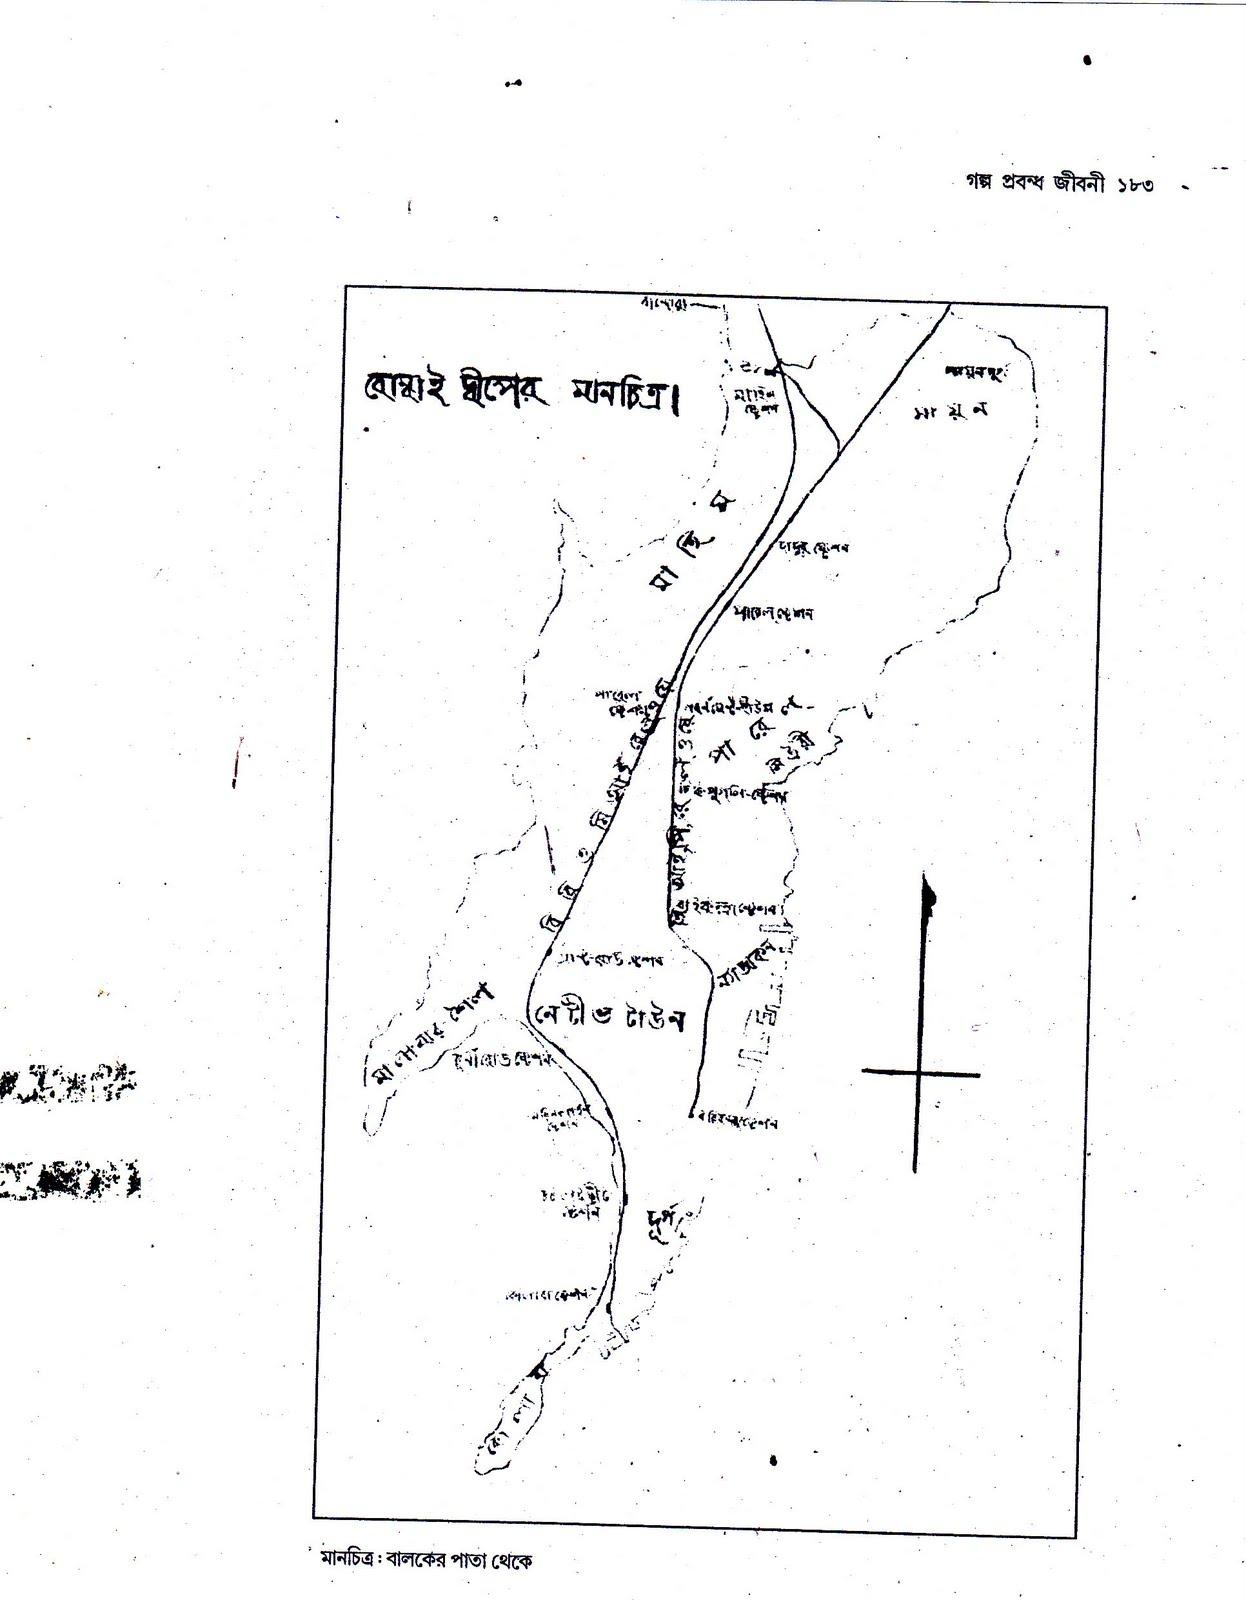 SMARAKA GRANTHA: Balaka, Satyendranath Tagore